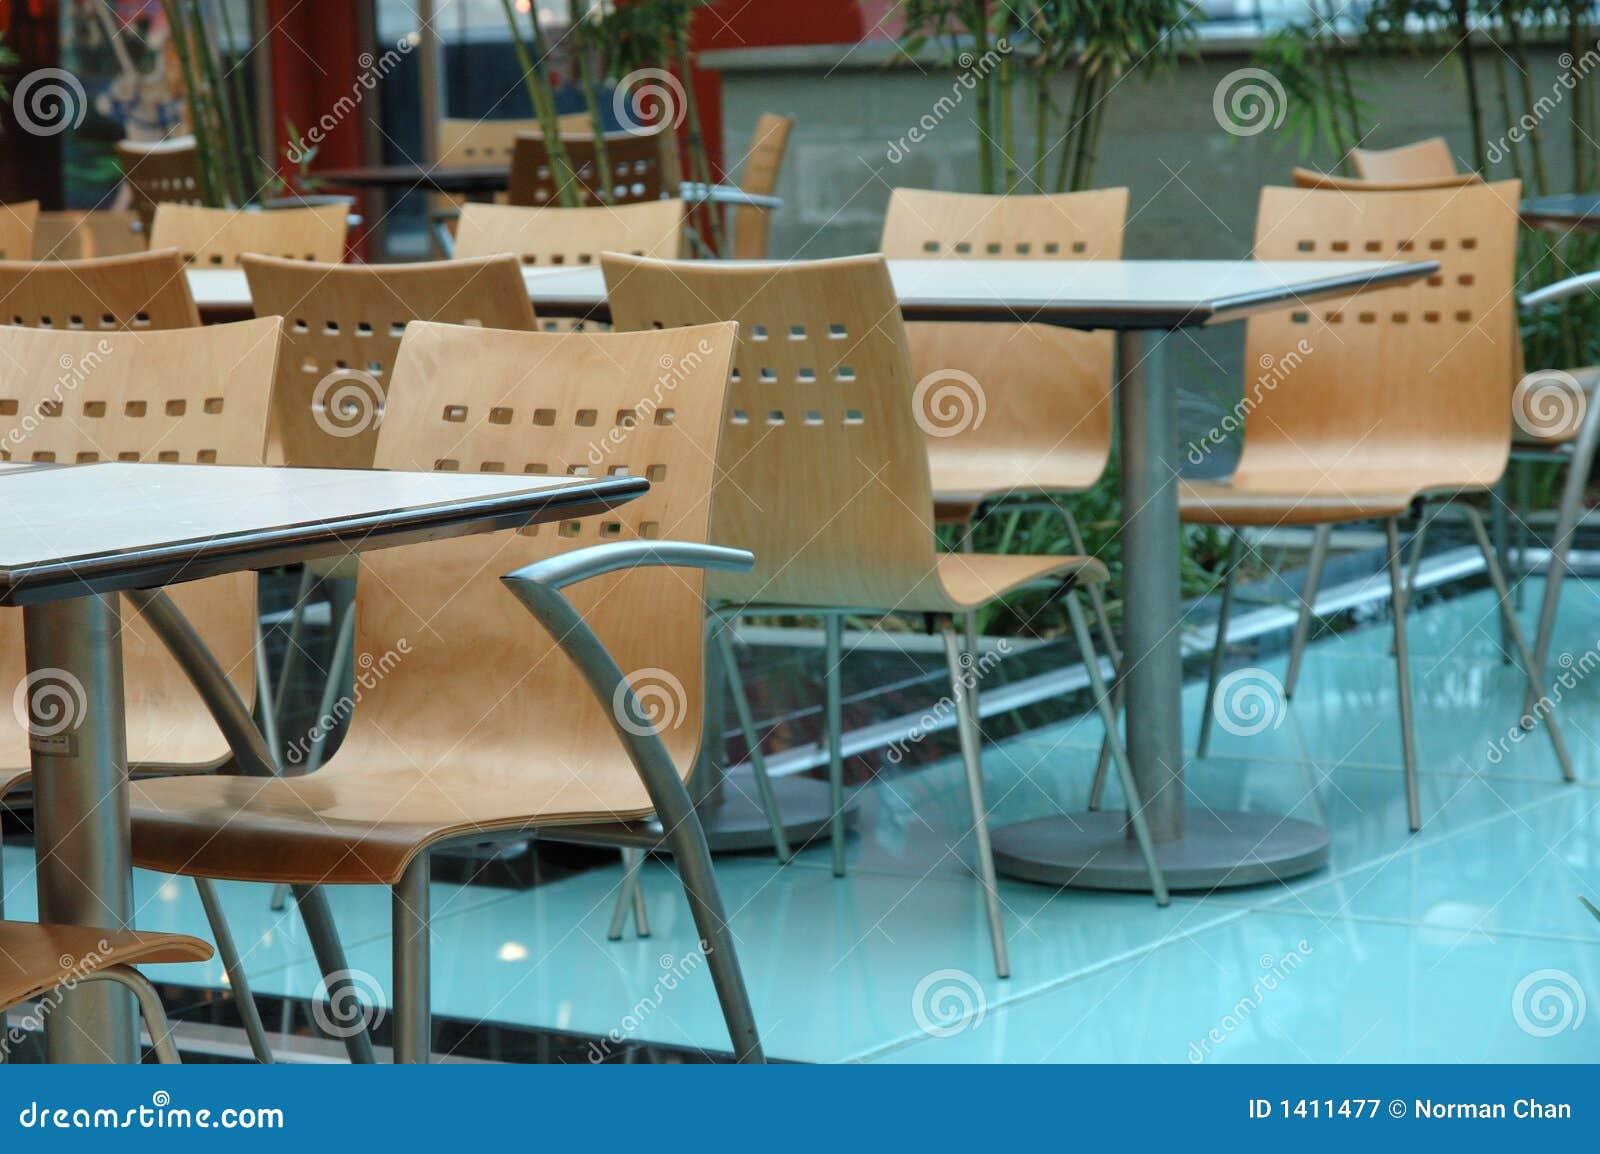 Interior design of food court area stock image image of for Interior designers in my area